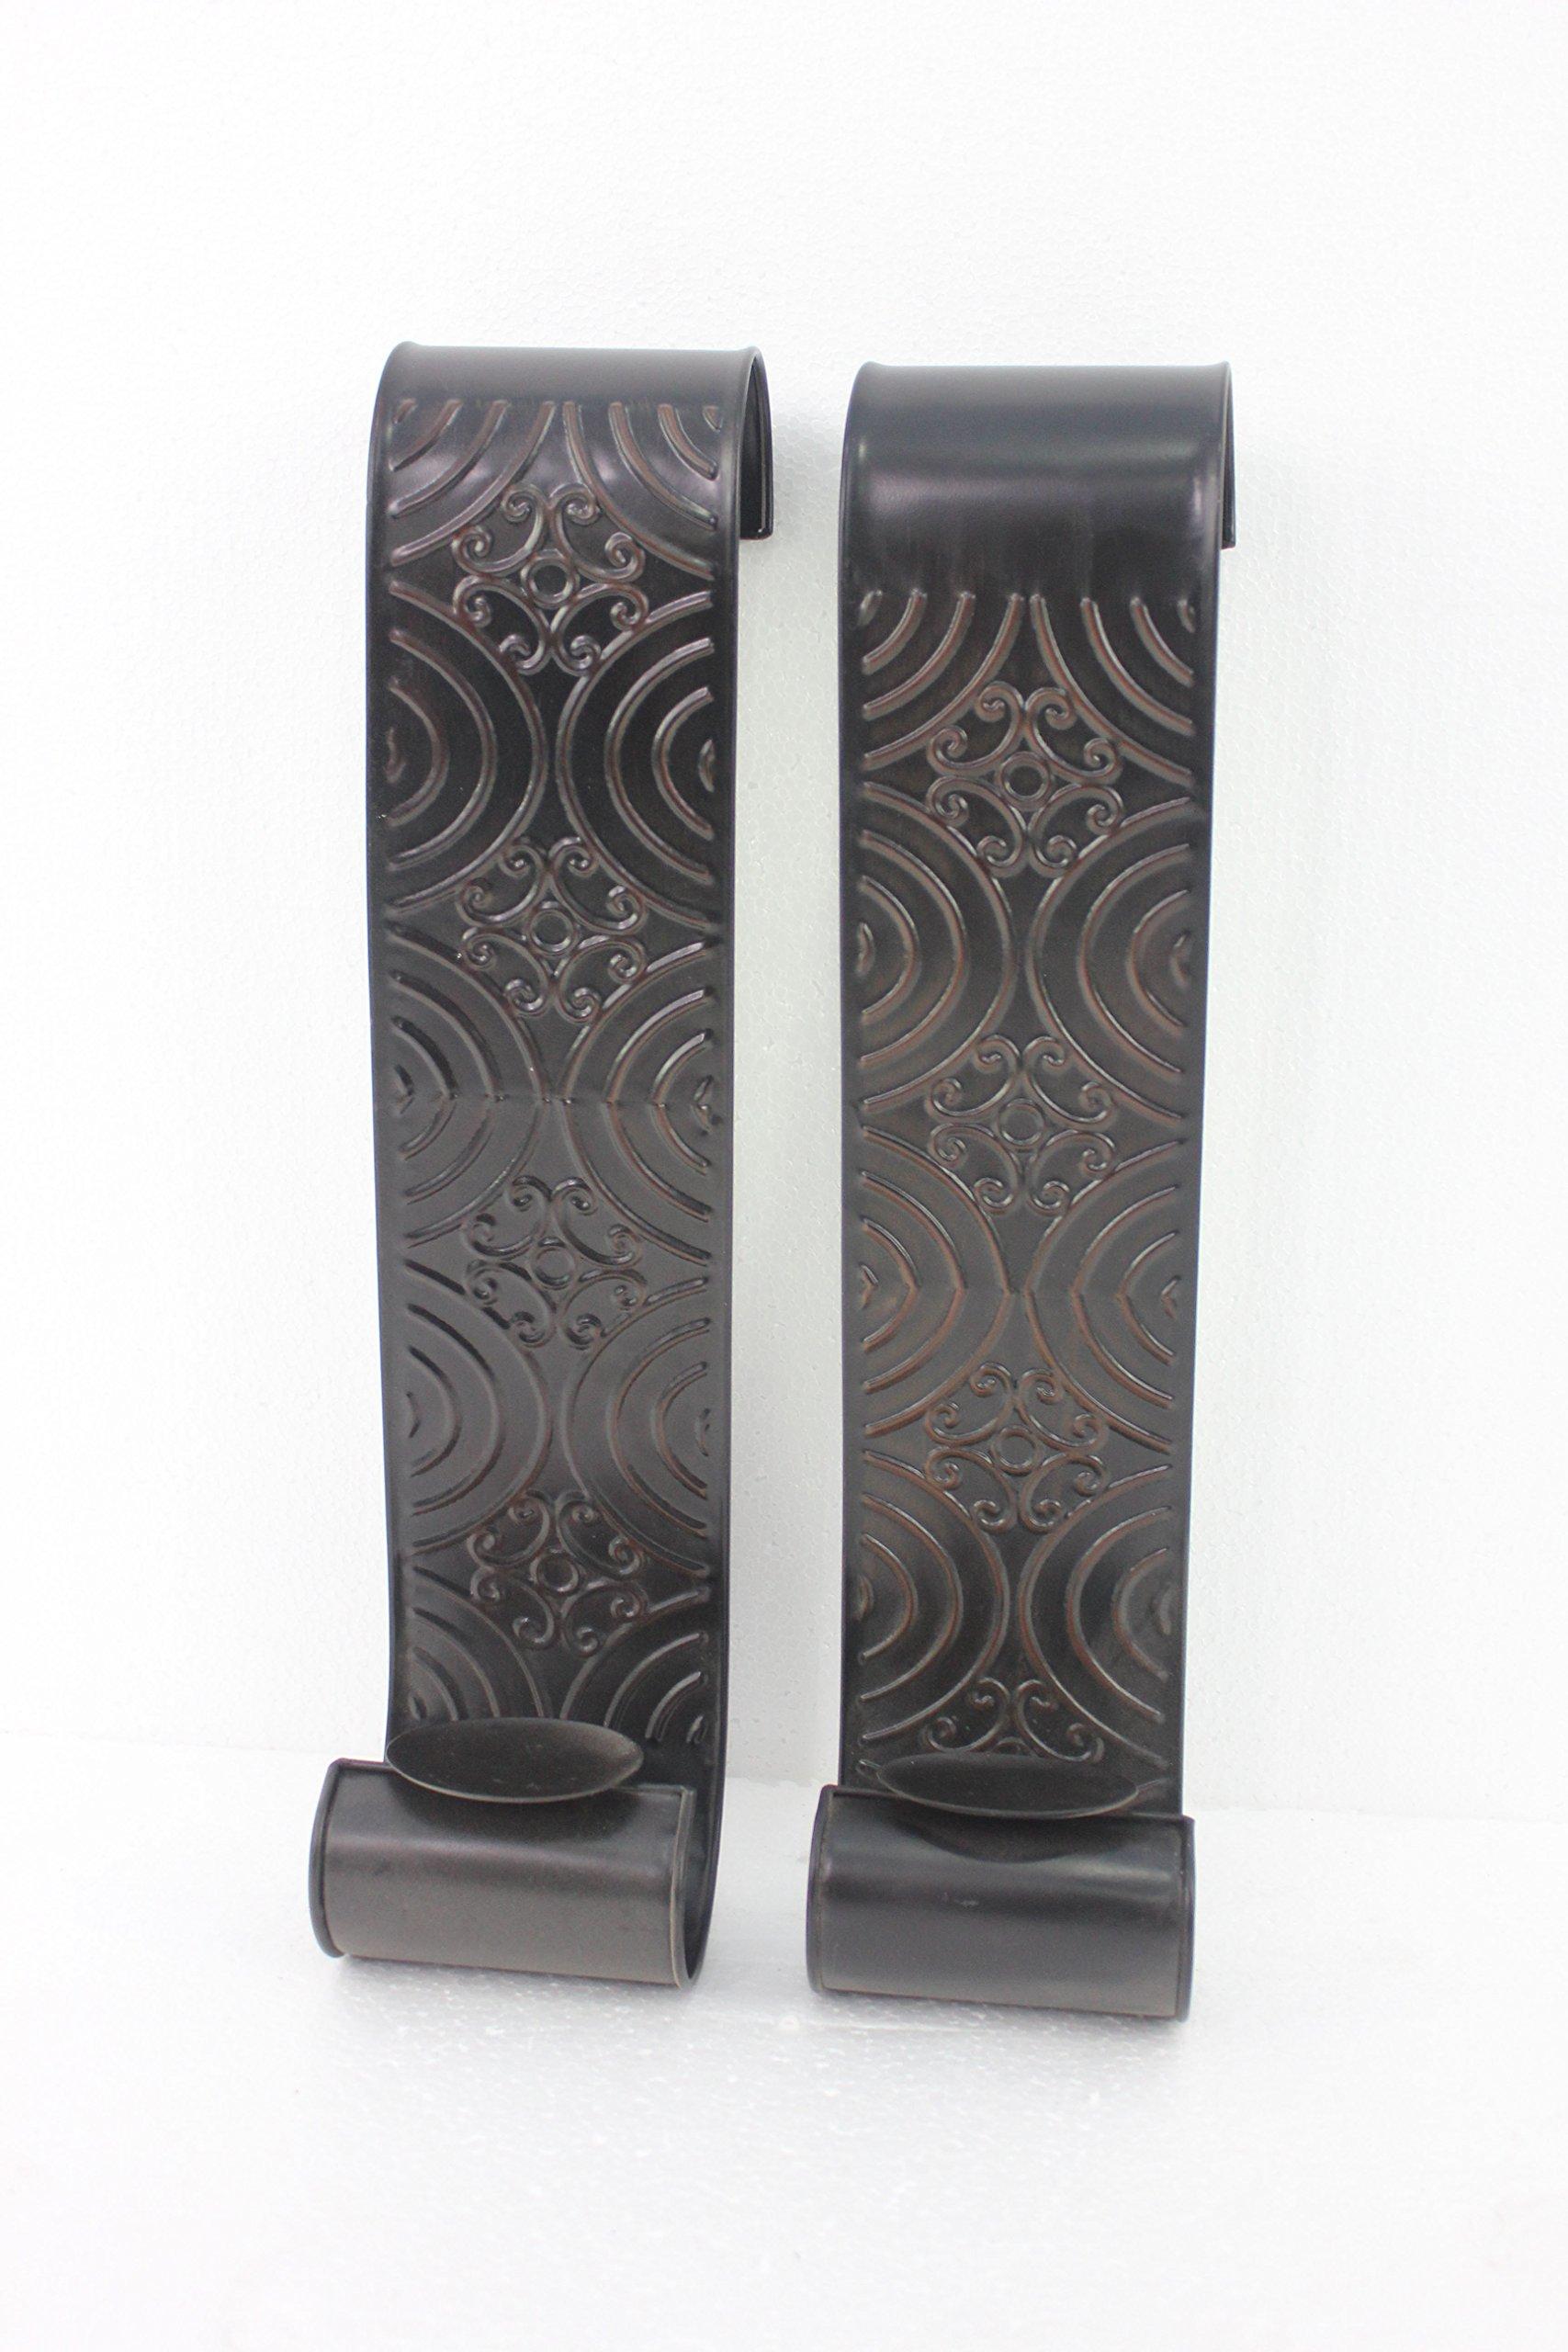 Teton Home WD-056 Metal Sconce